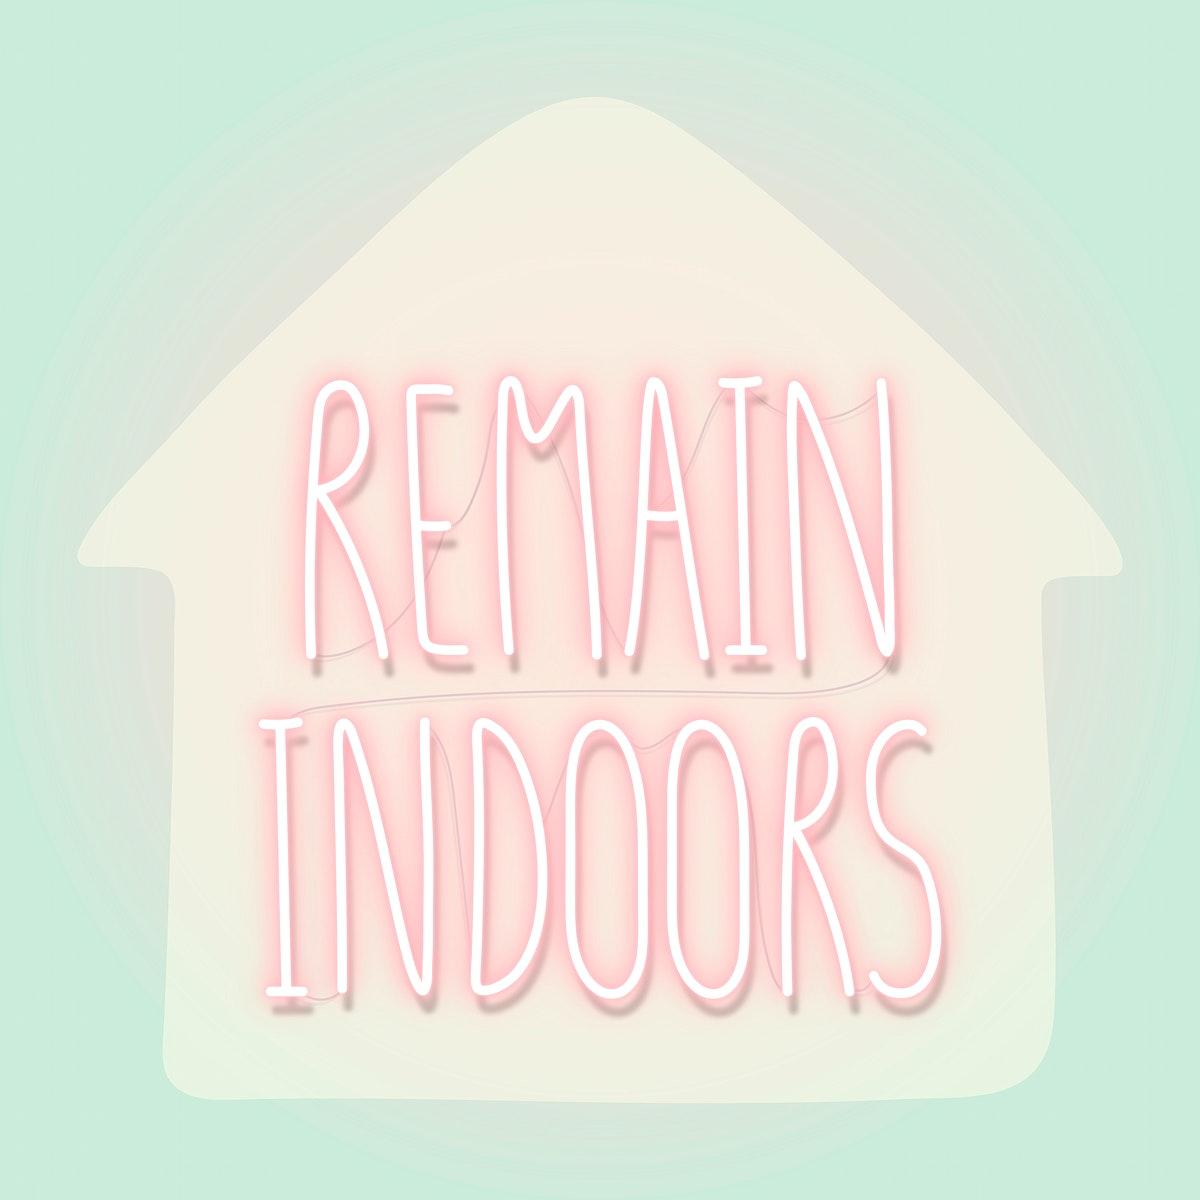 Remain indoors during coronavirus pandemic neon sign vector